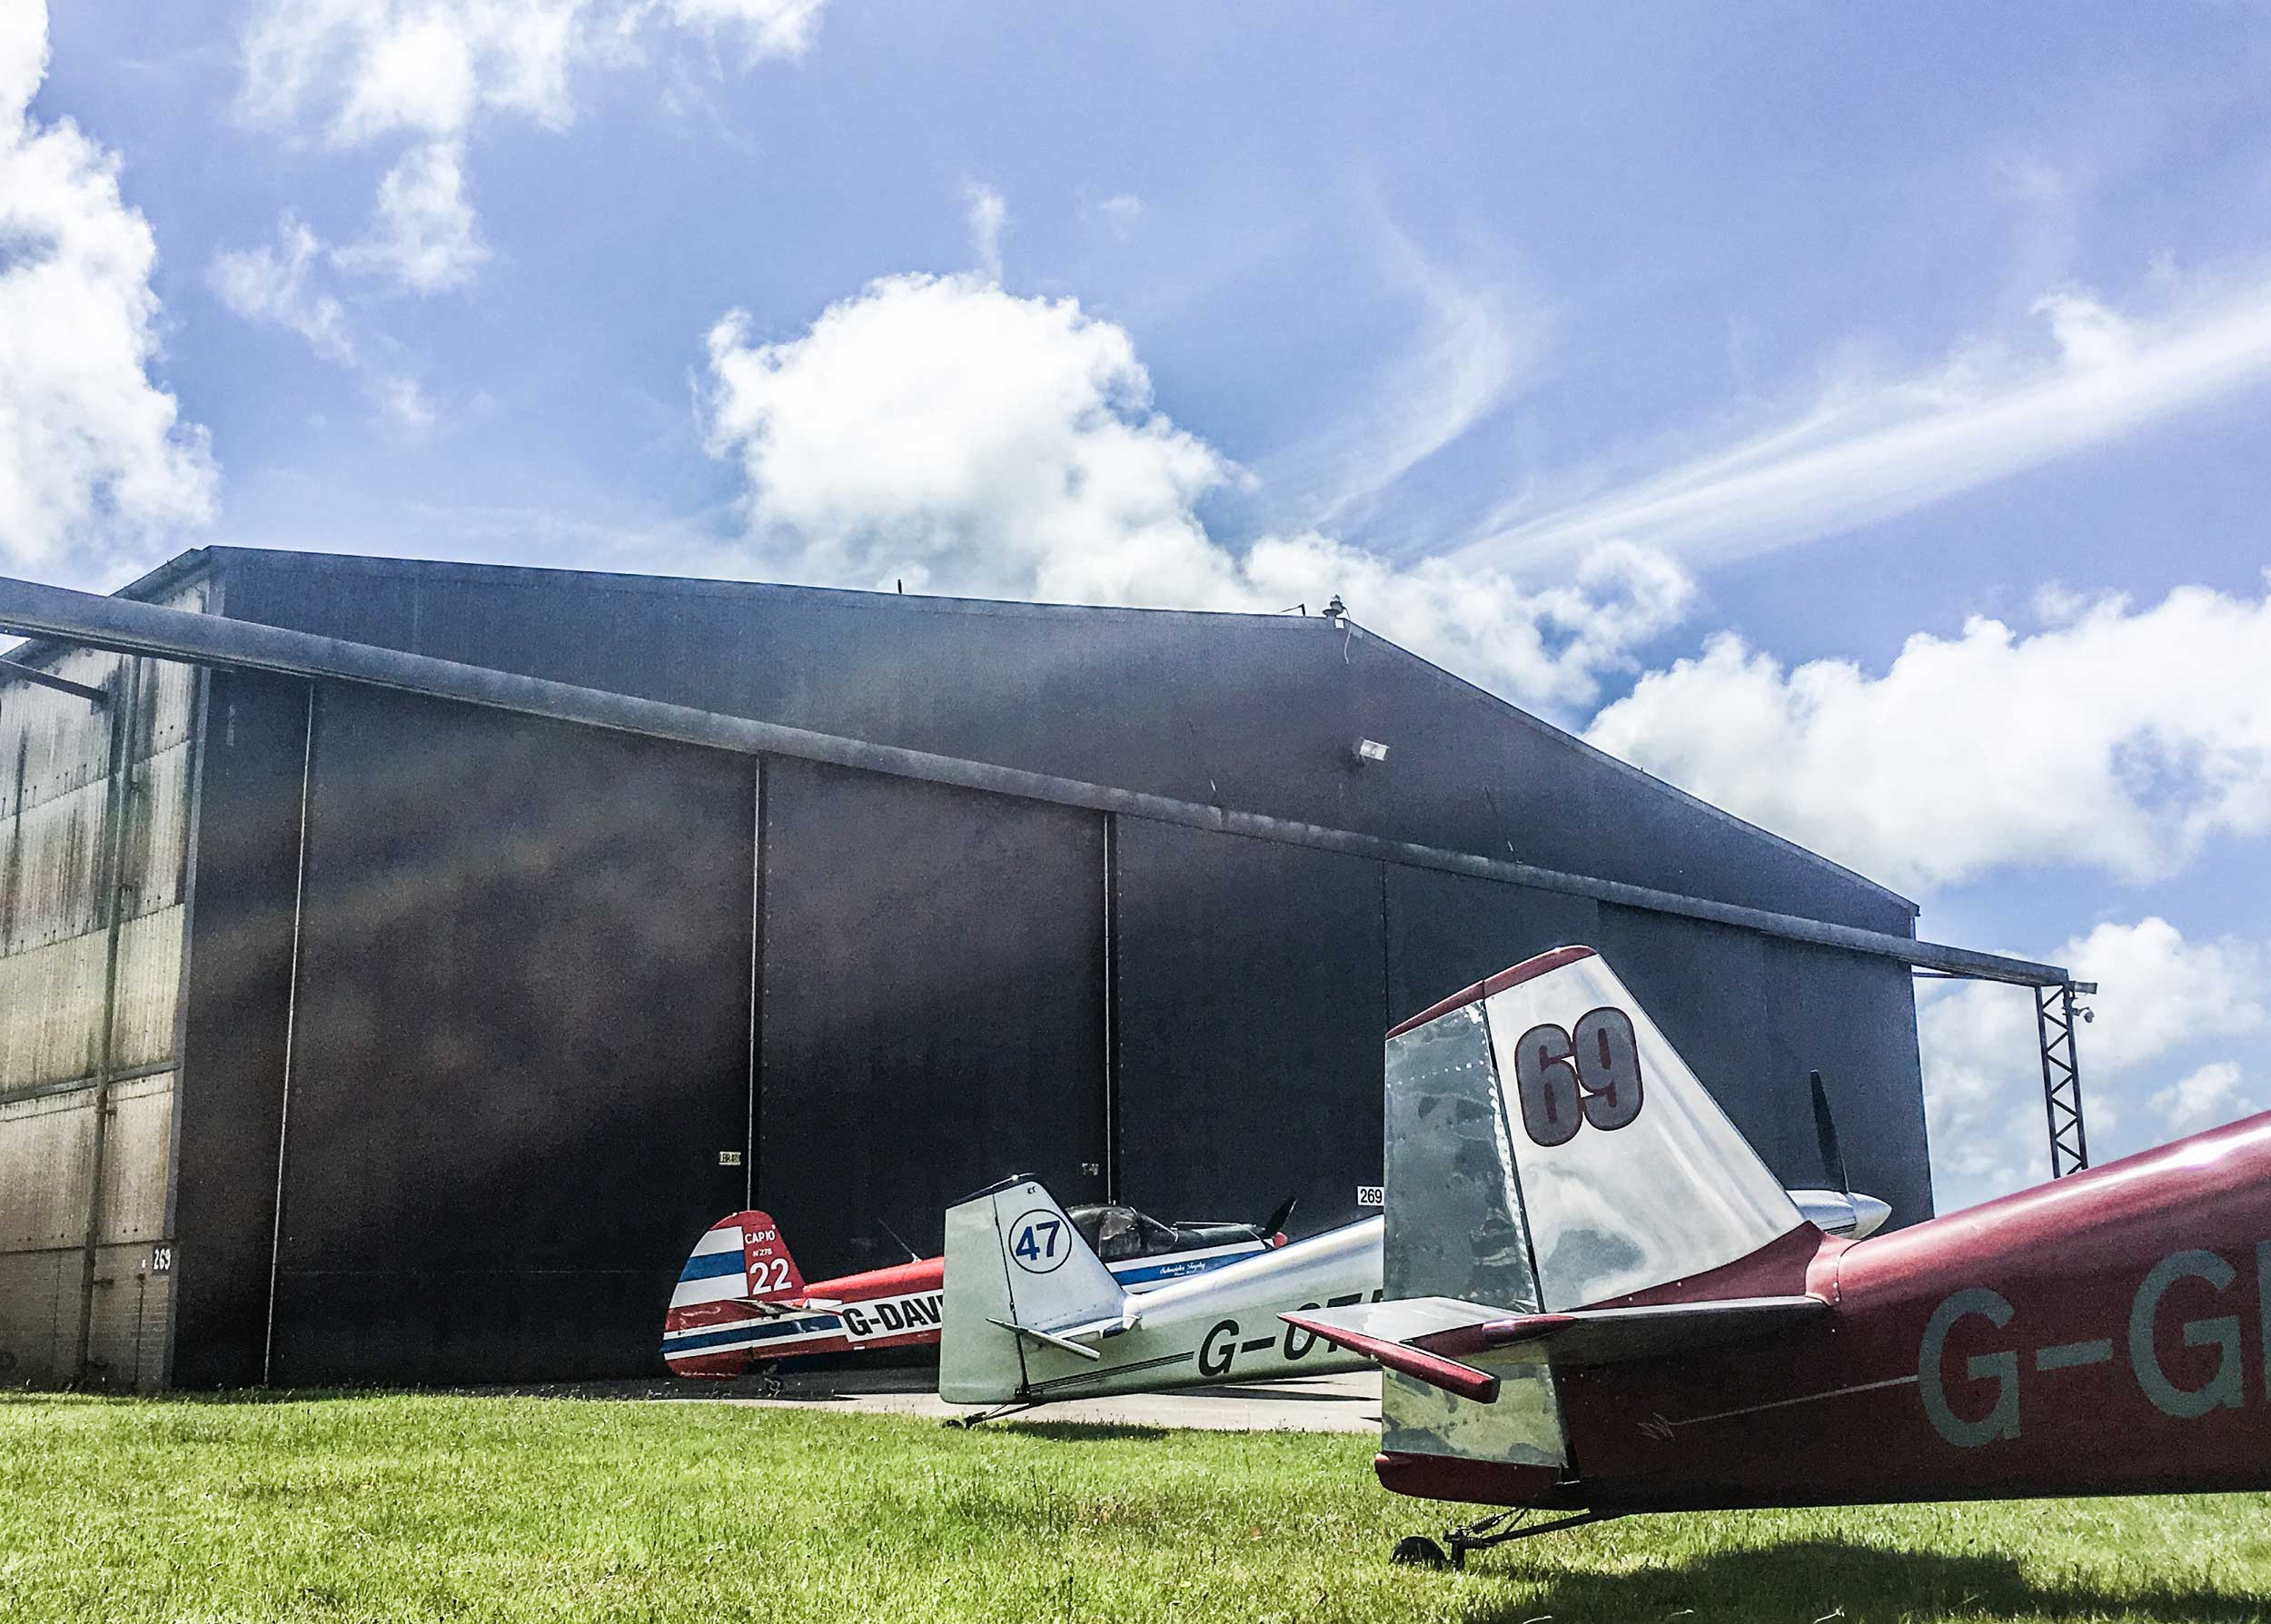 Llanbedr hangar